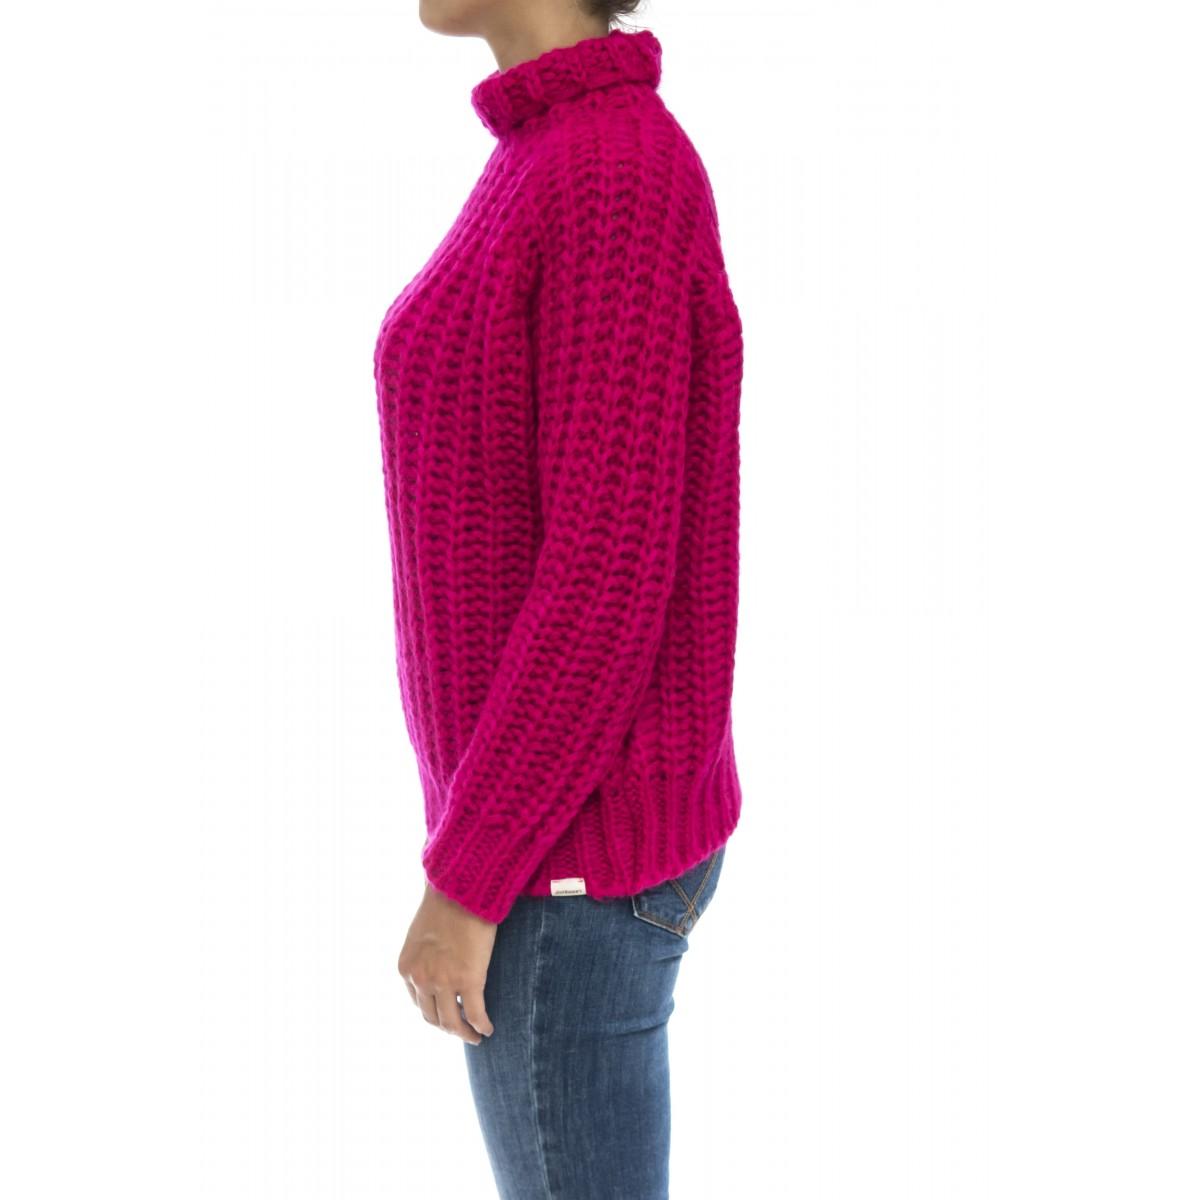 Maglieria - Half neck moer